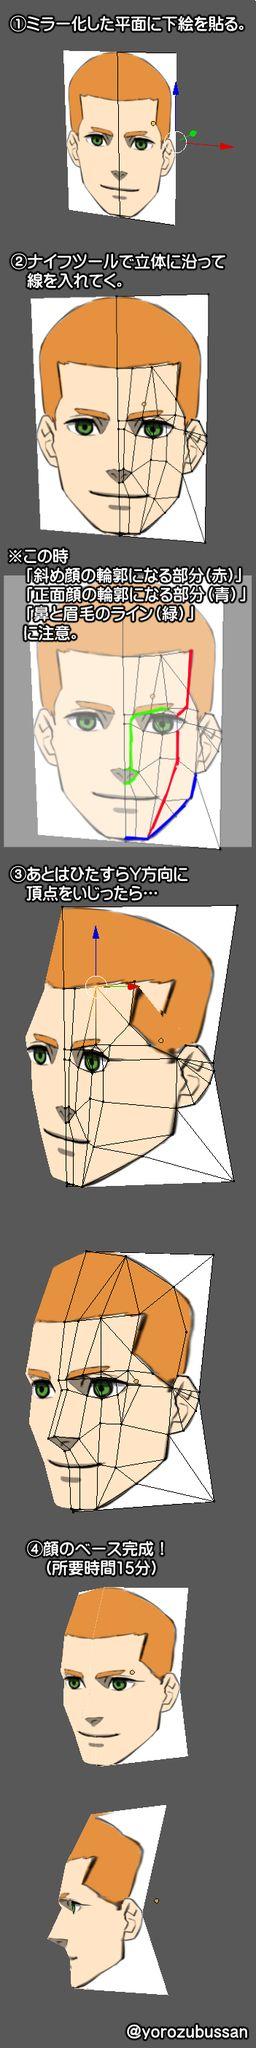 """blenderのナイフツールでささっと顔のベース作るやり方。"""